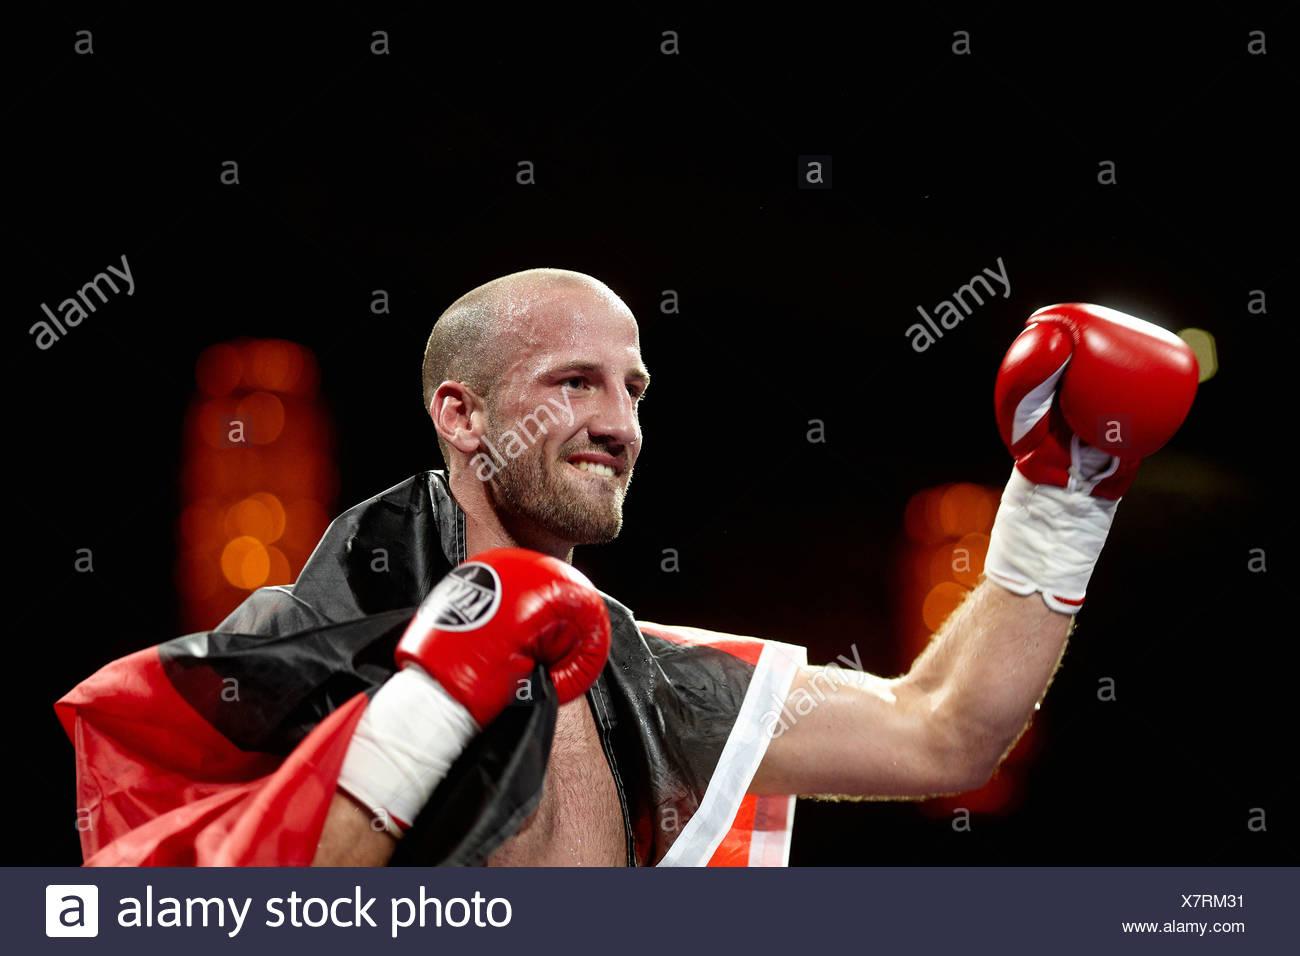 Timo Herzberg, Profi Thai and Kickboxing Gala, Koblenz, 13.10.2012, Koblenz, Rhineland-Palatinate - Stock Image